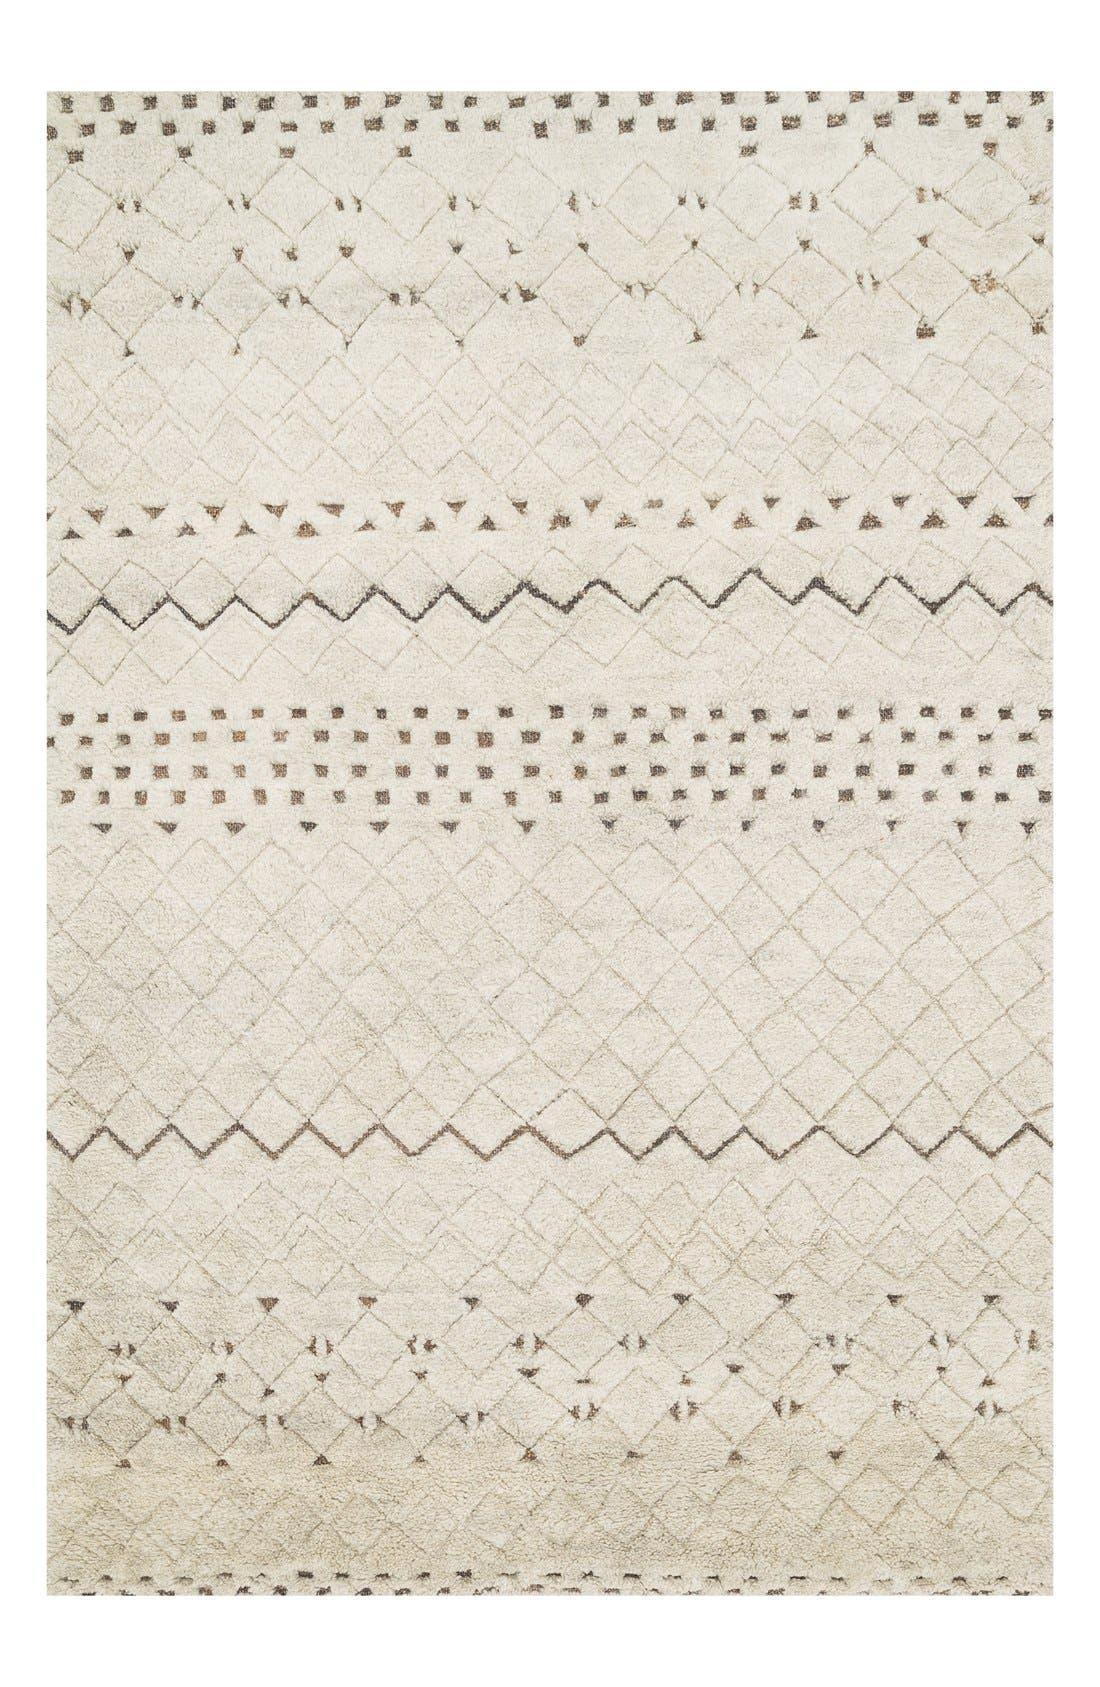 Alternate Image 1 Selected - Loloi 'Tanzania' Wool & Jute Area Rug